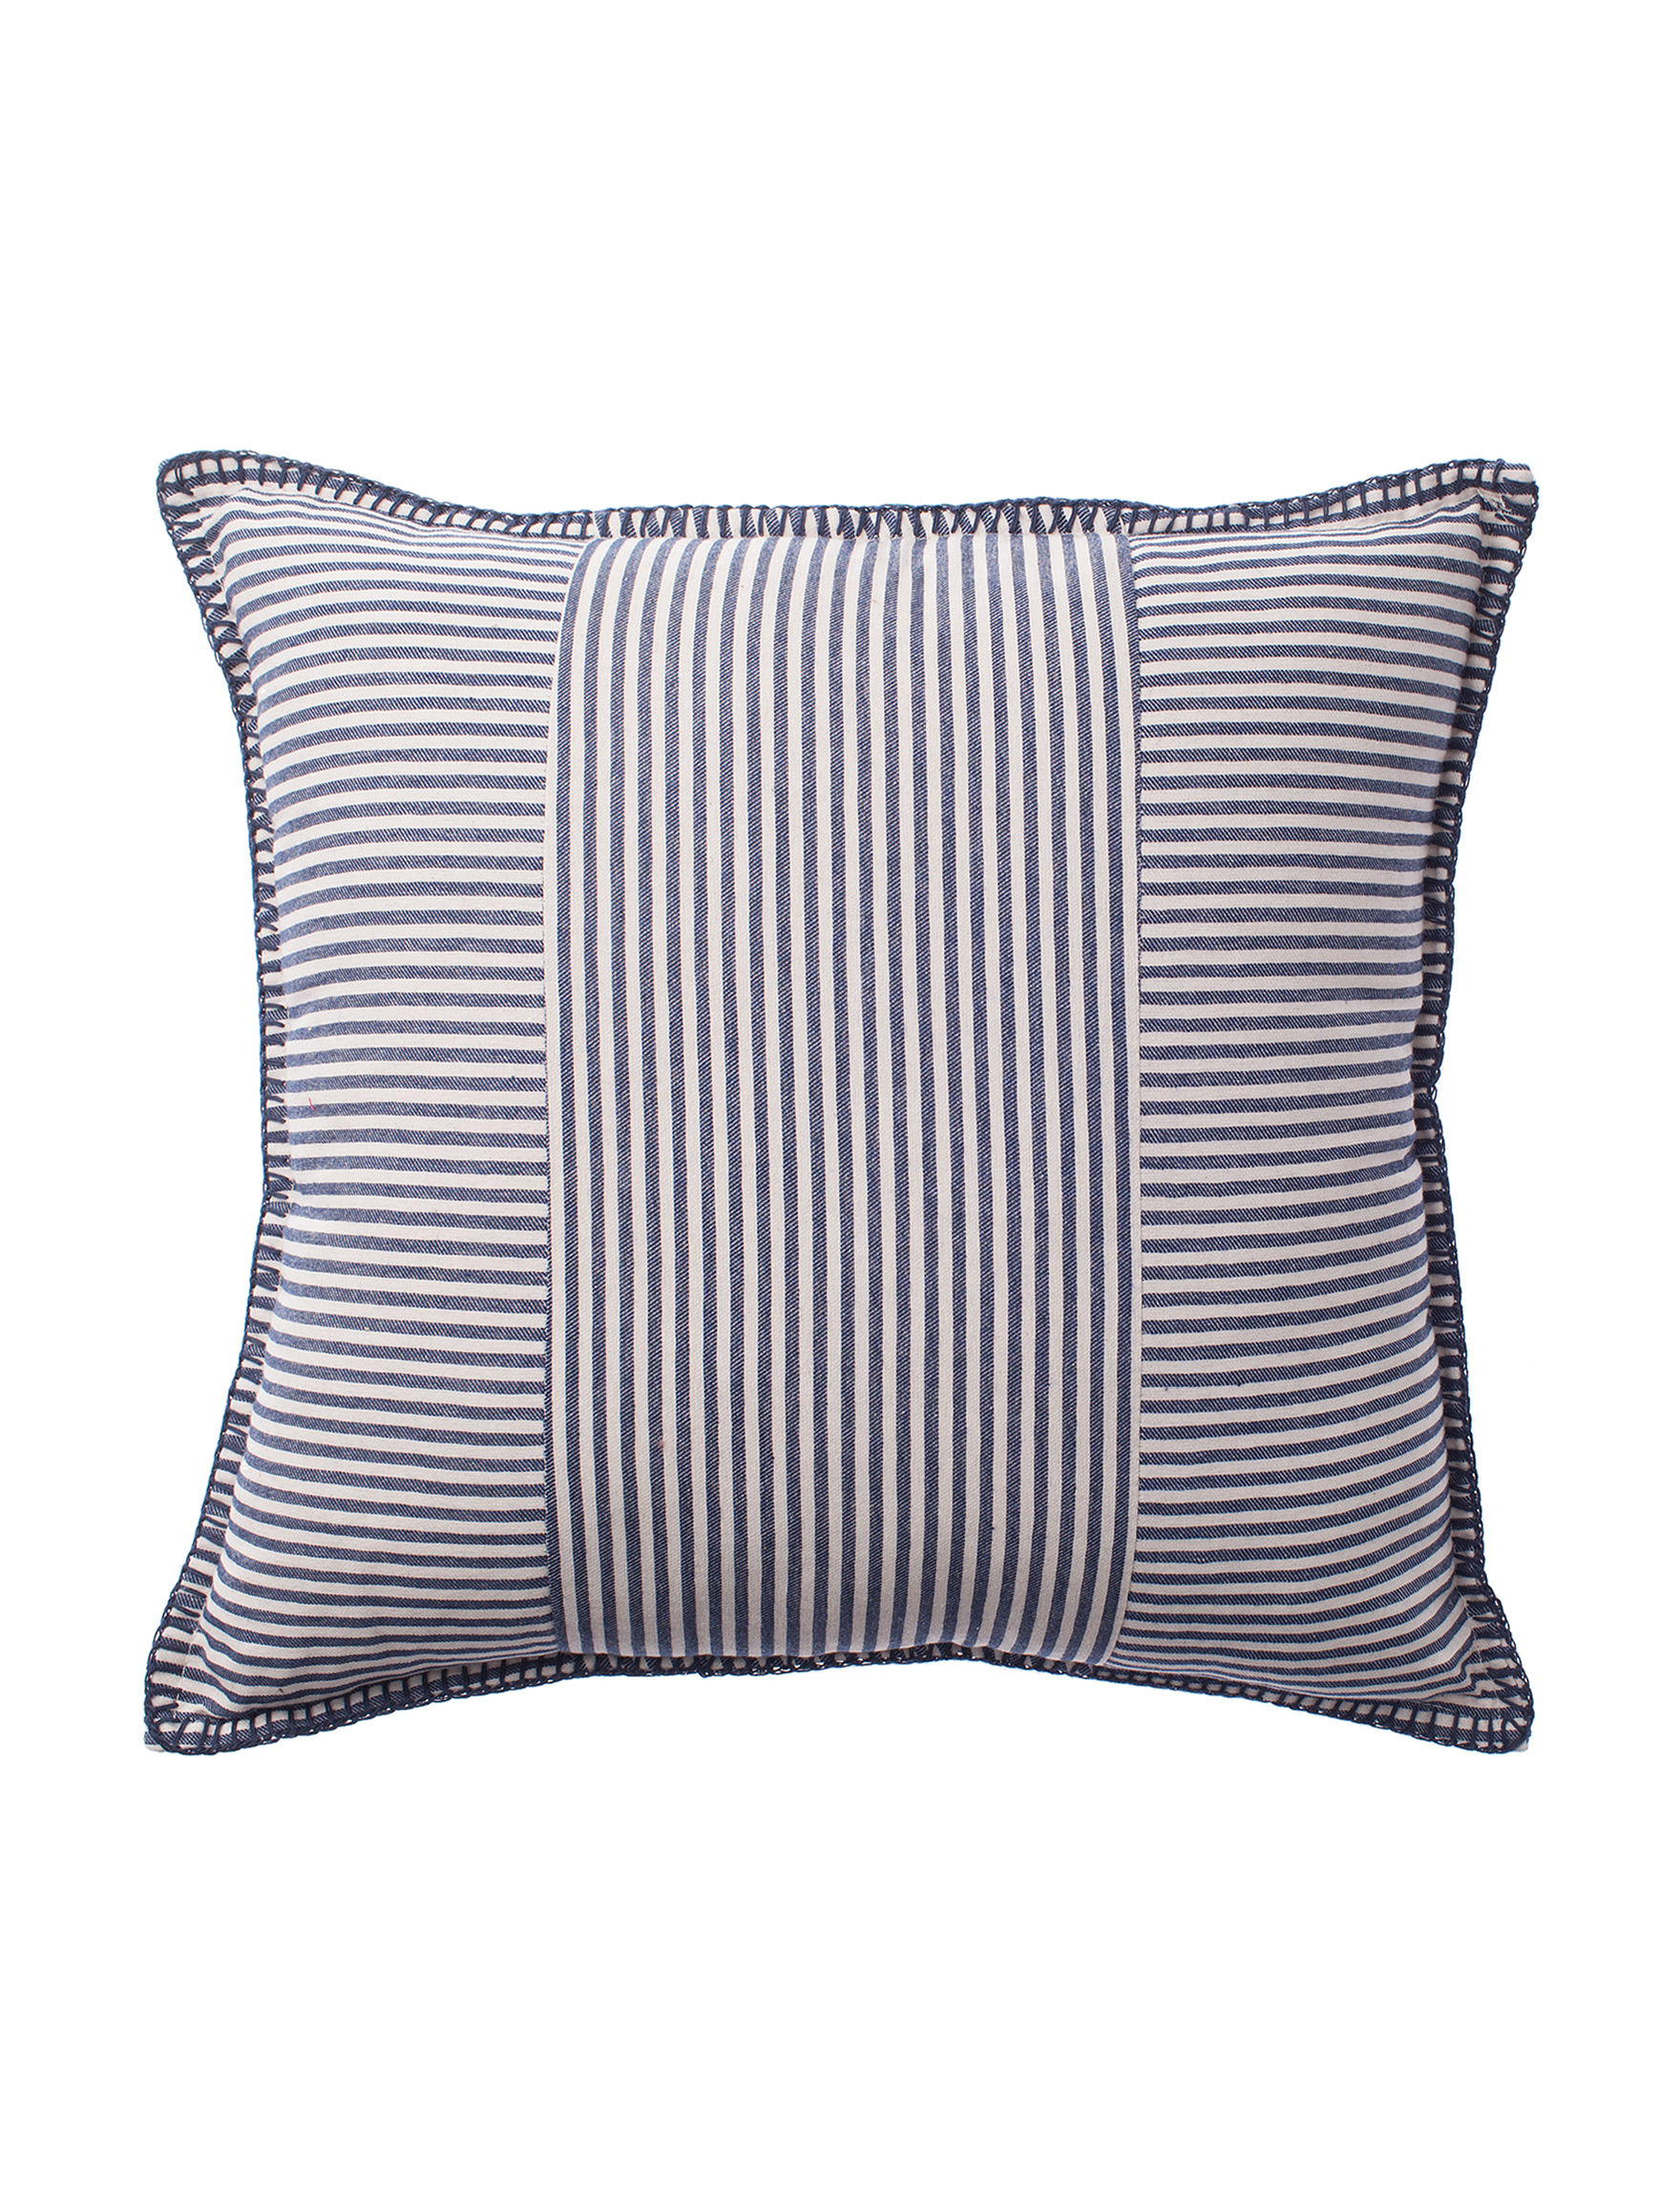 Deco White / Navy Decorative Pillows